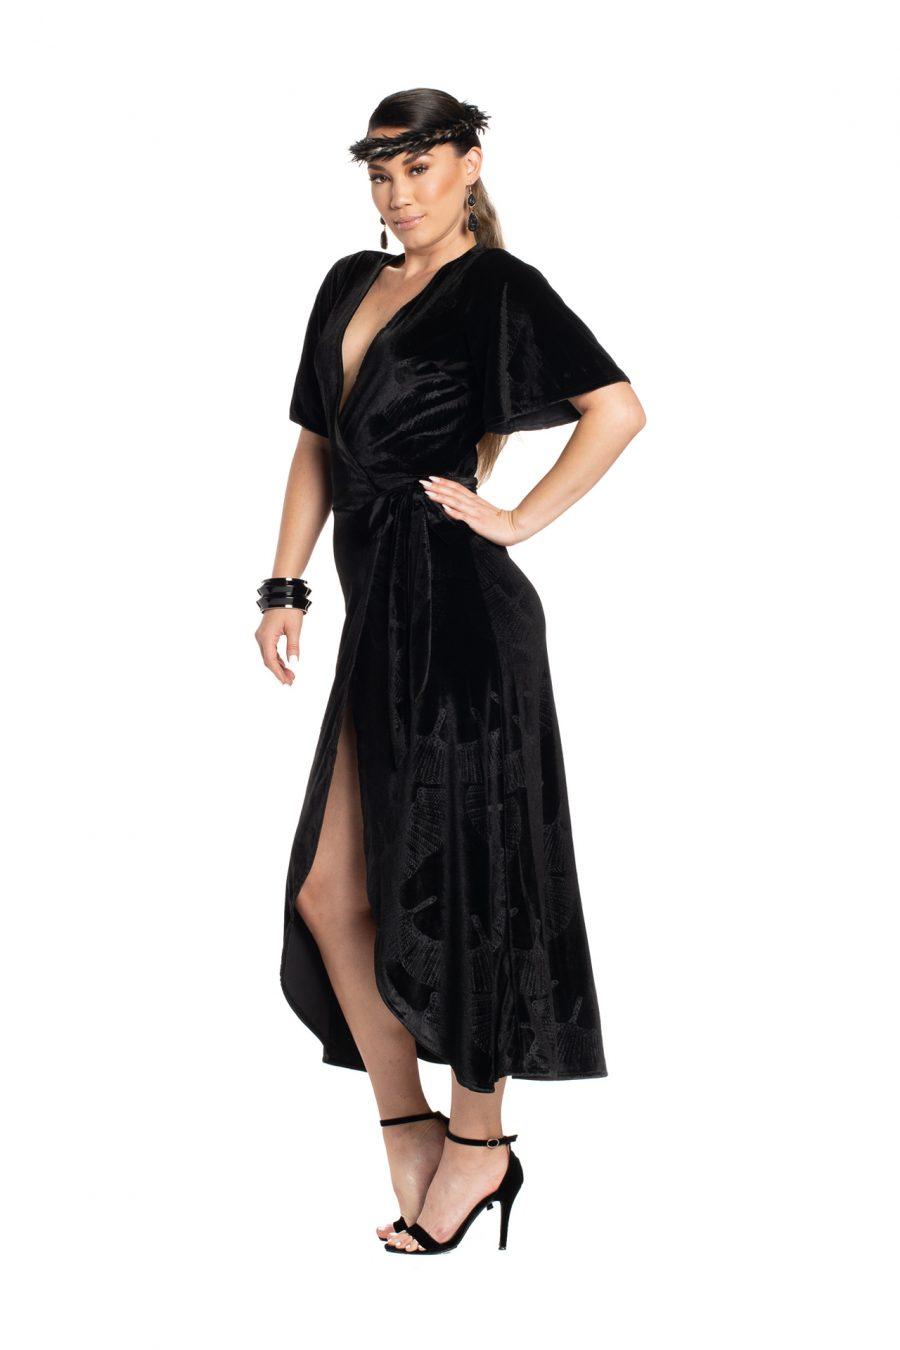 Model wearing Peahi Wrap Dress in Black - Side View